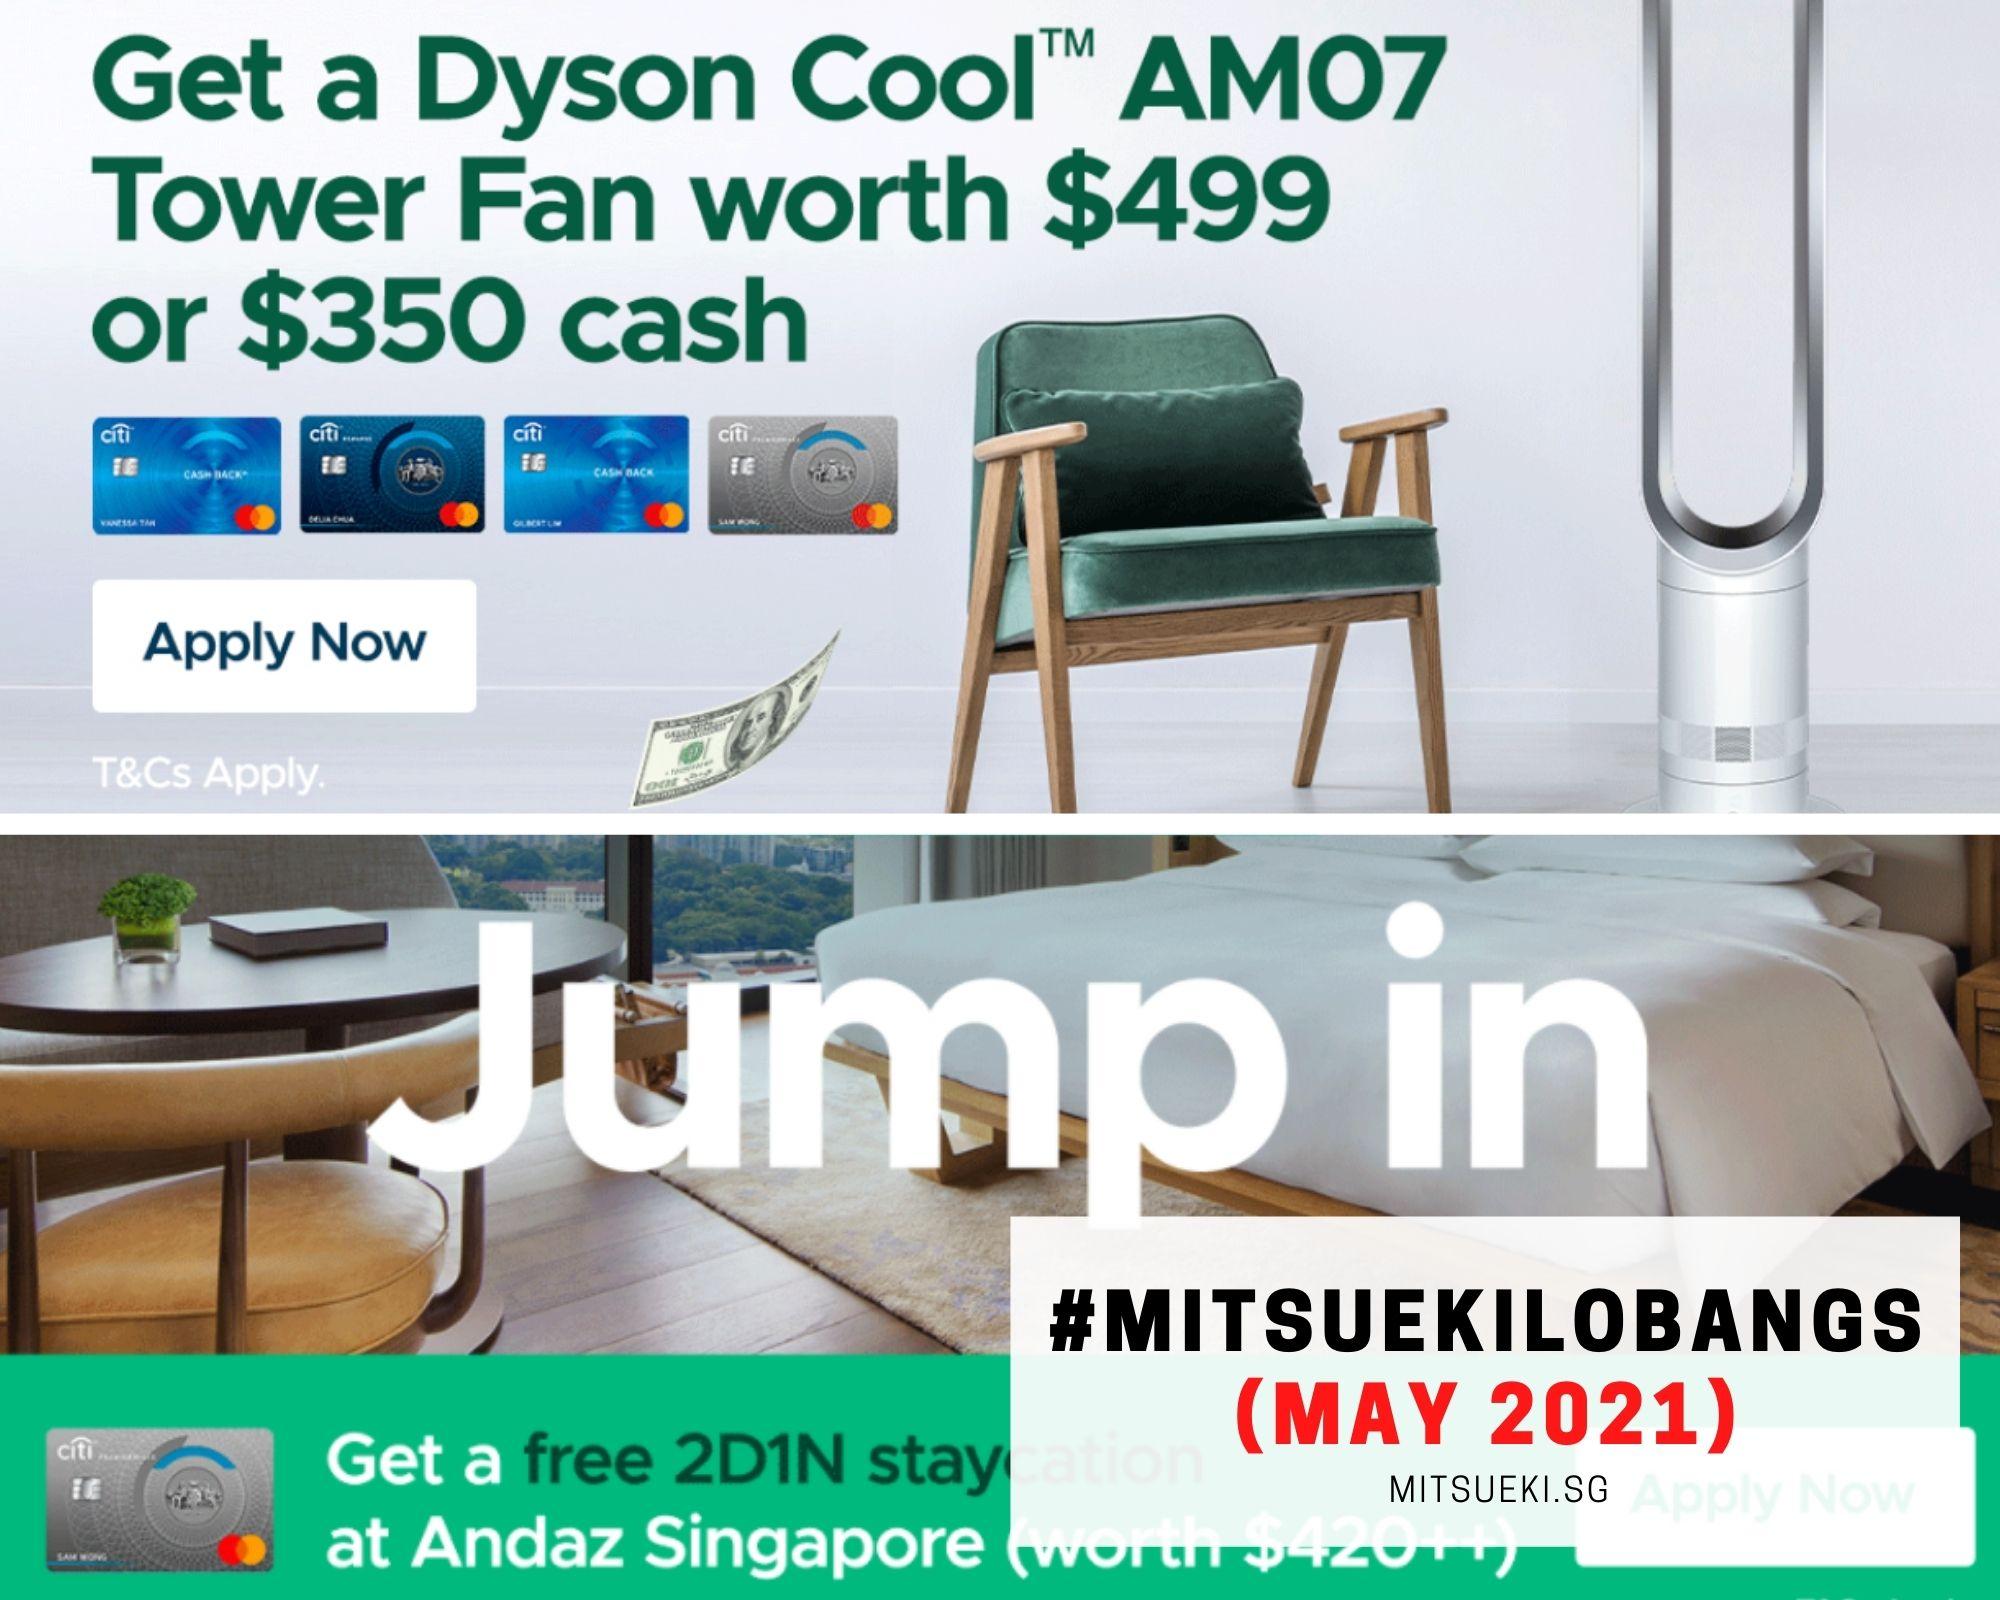 mitsueki lobang may 2021